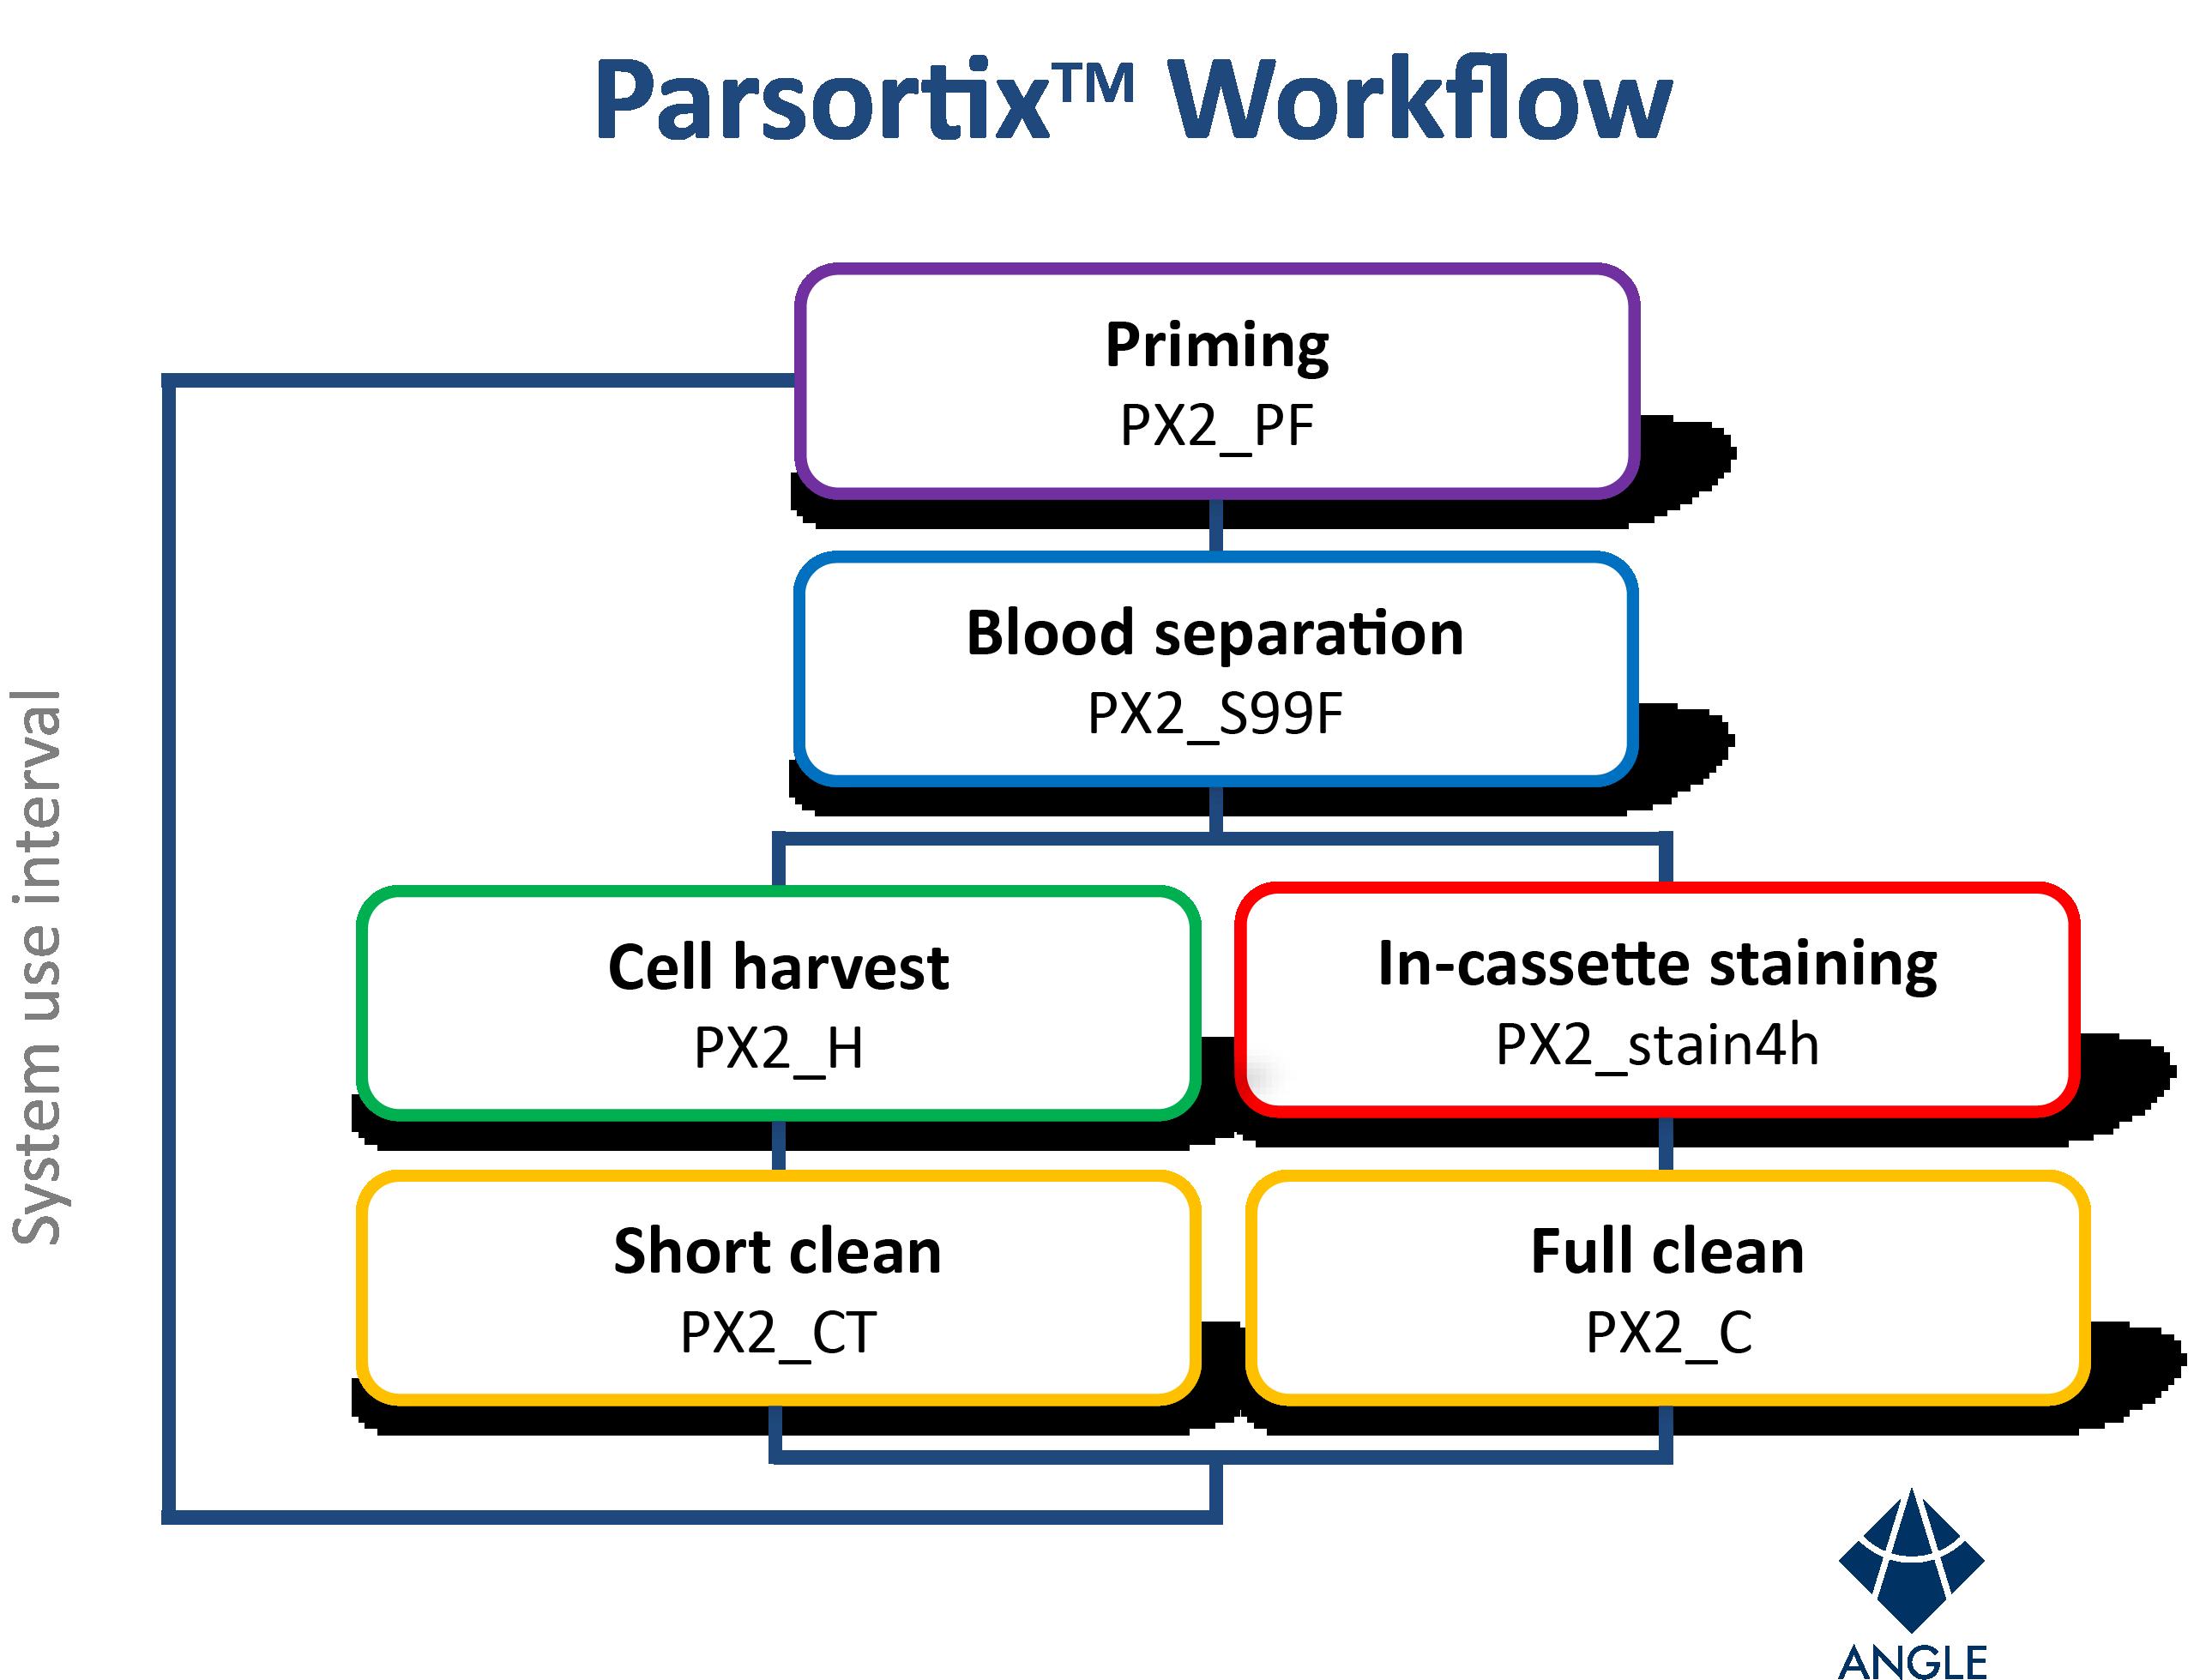 Parsortix_US_Workflow_Chart